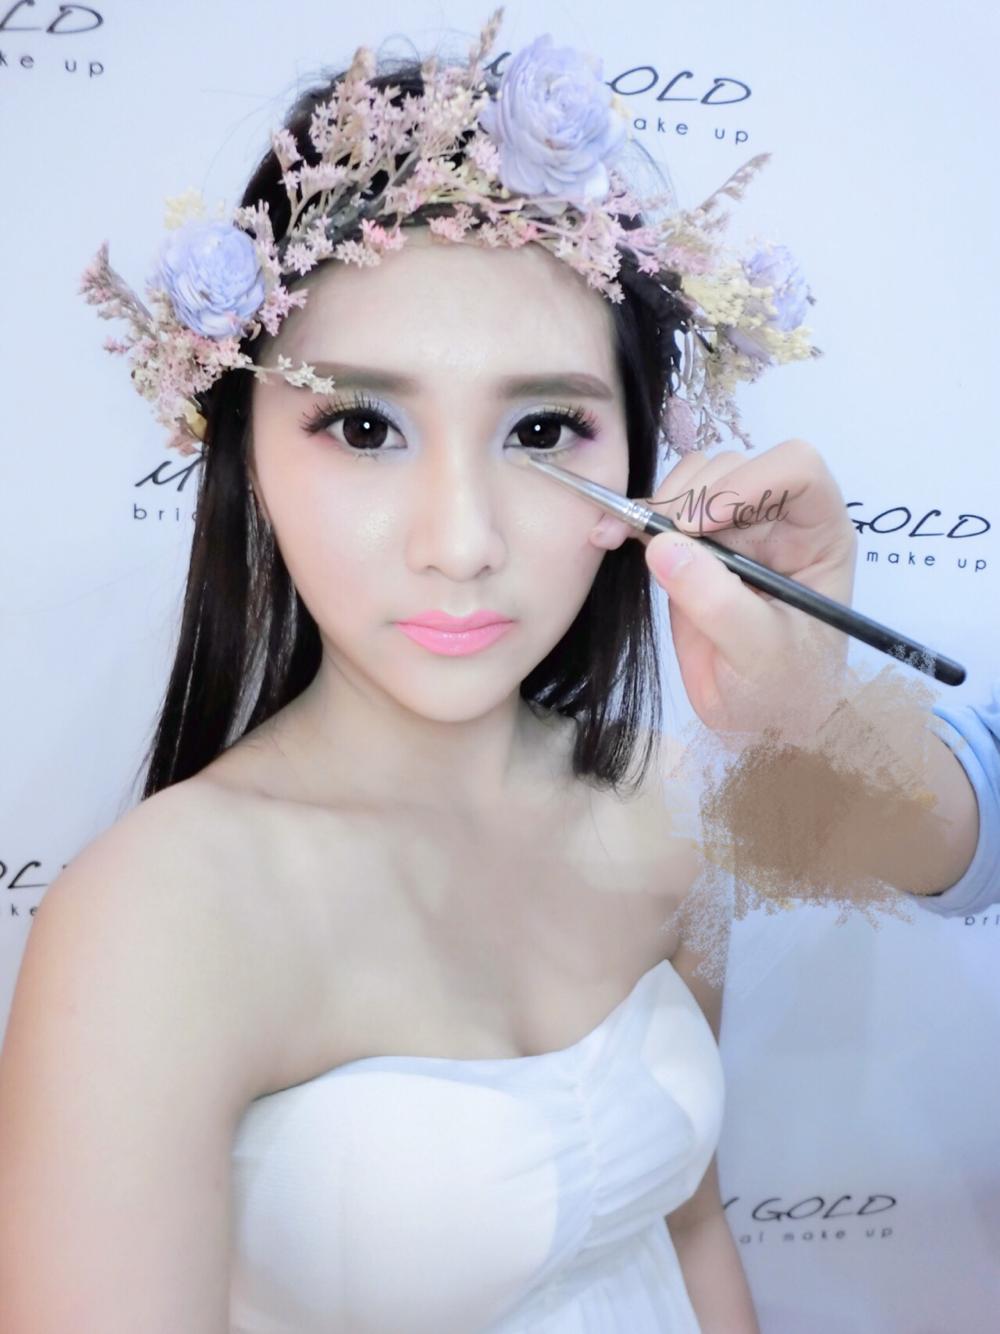 wedding by mgold hair make up studio | bridestory